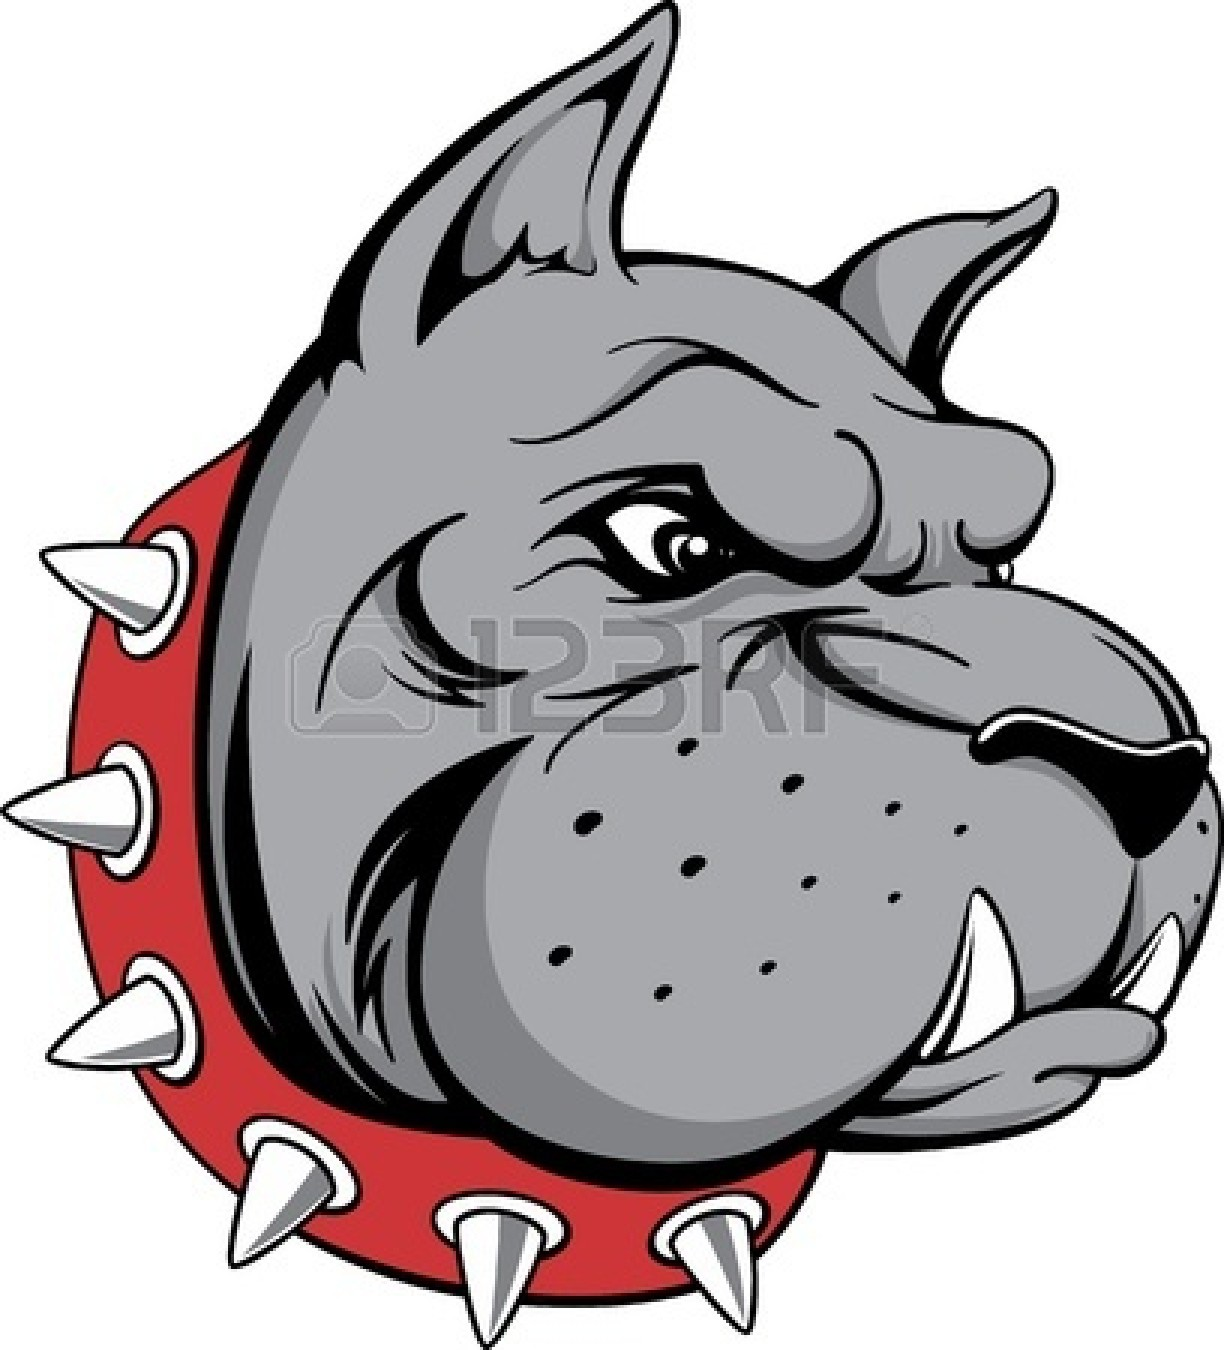 Bulldog Mascot Images Free Download Best Bulldog Mascot Images On